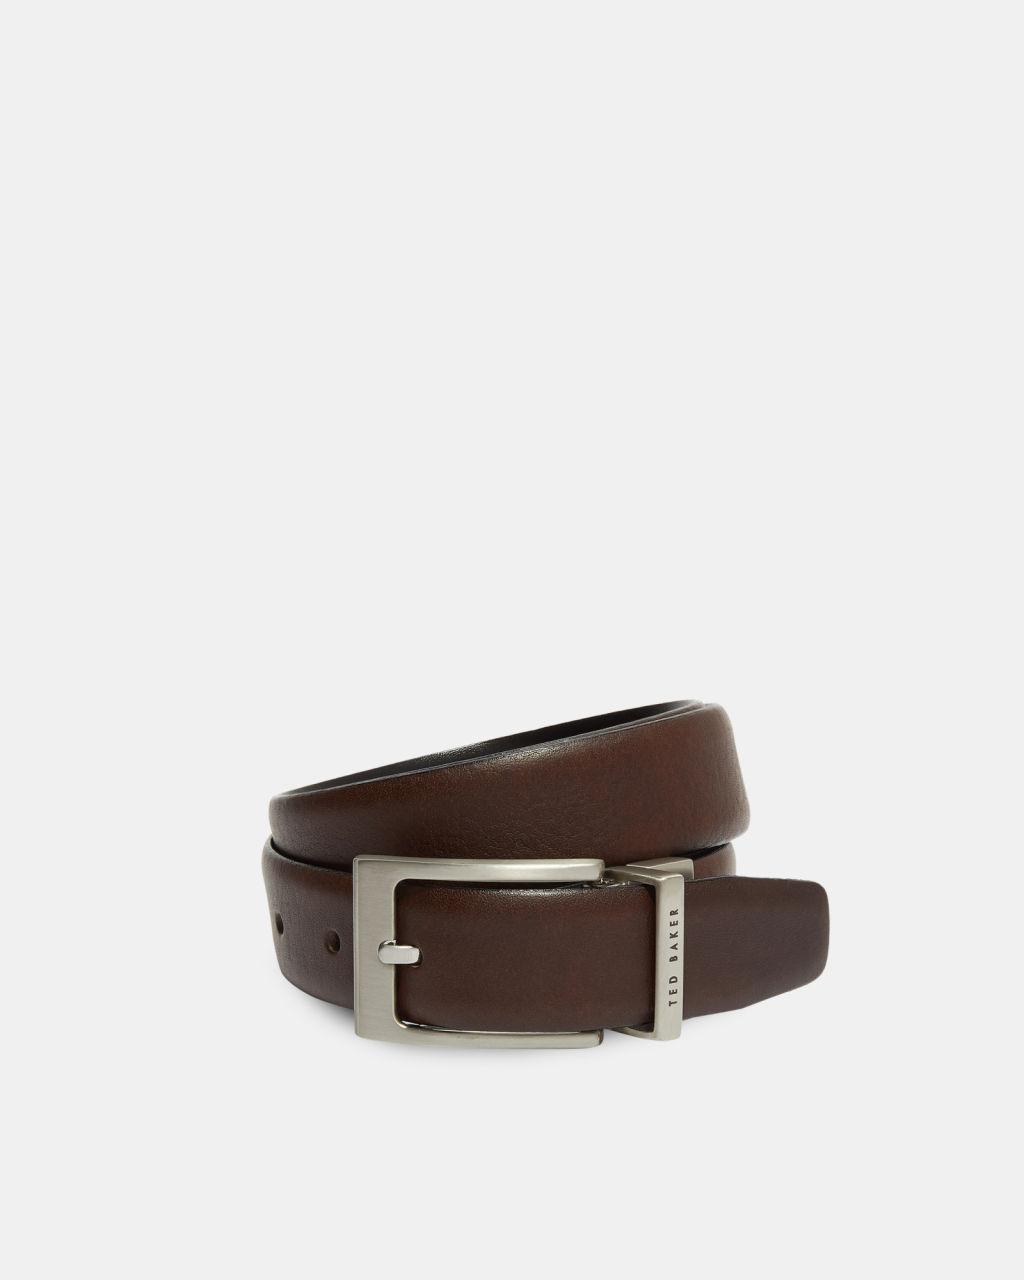 uk%2FMens%2FAccessories%2FBelts%2FKARMER-Reversible-leather-belt-Chocolate%2FXH8M_KARMER_XCHOCOLATE_1.jpg.jpg